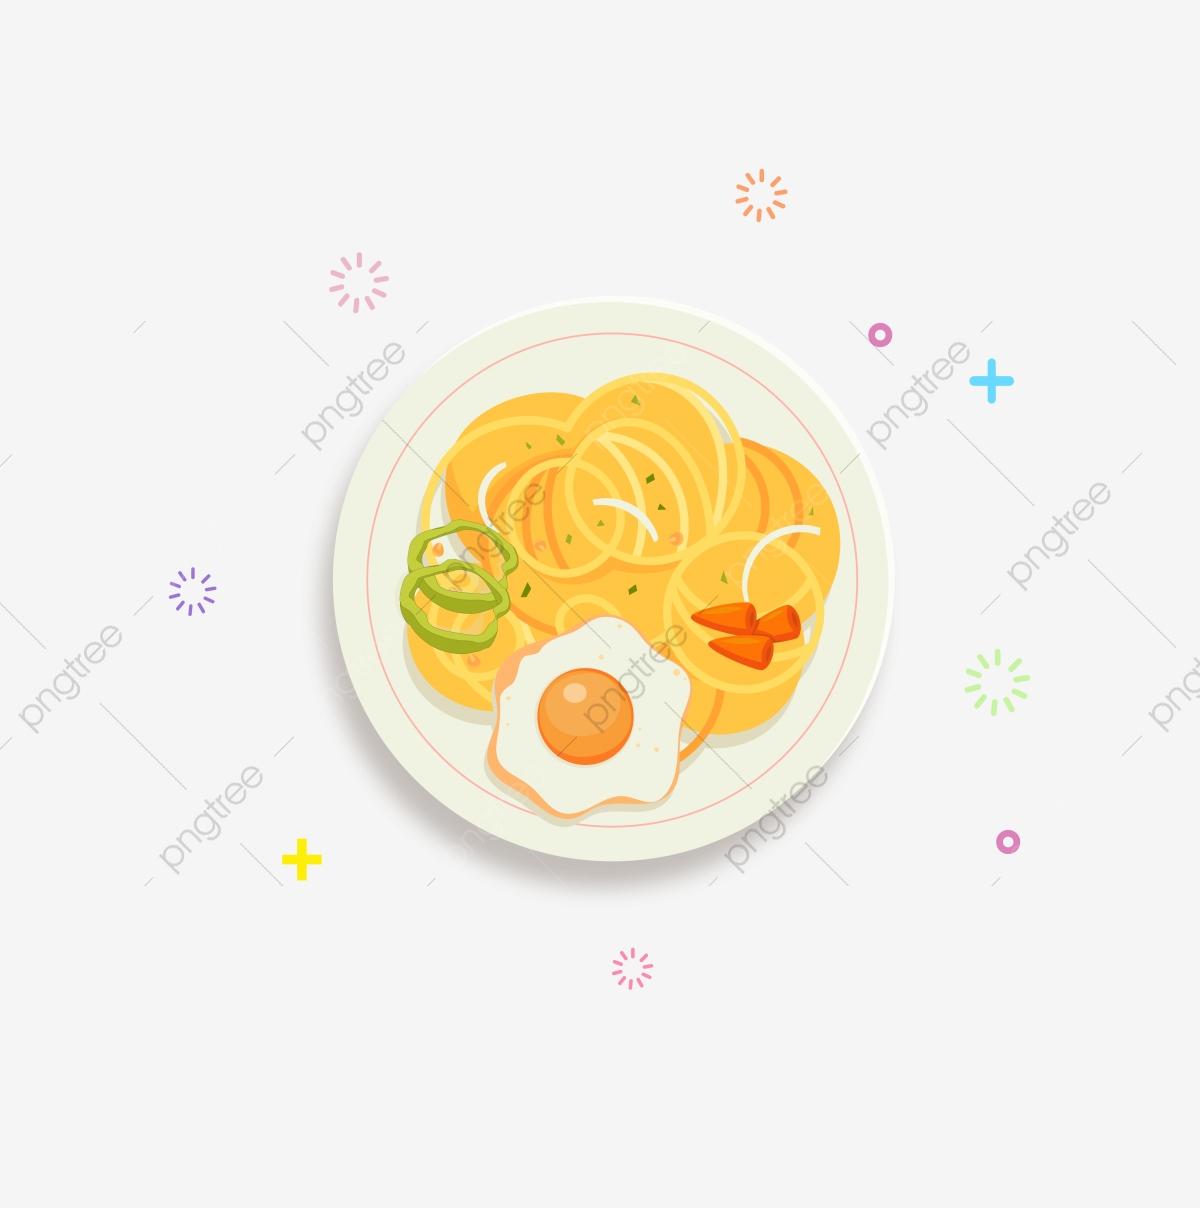 svg royalty free download Yunnan bridge noodles flour. Rice vector noodle